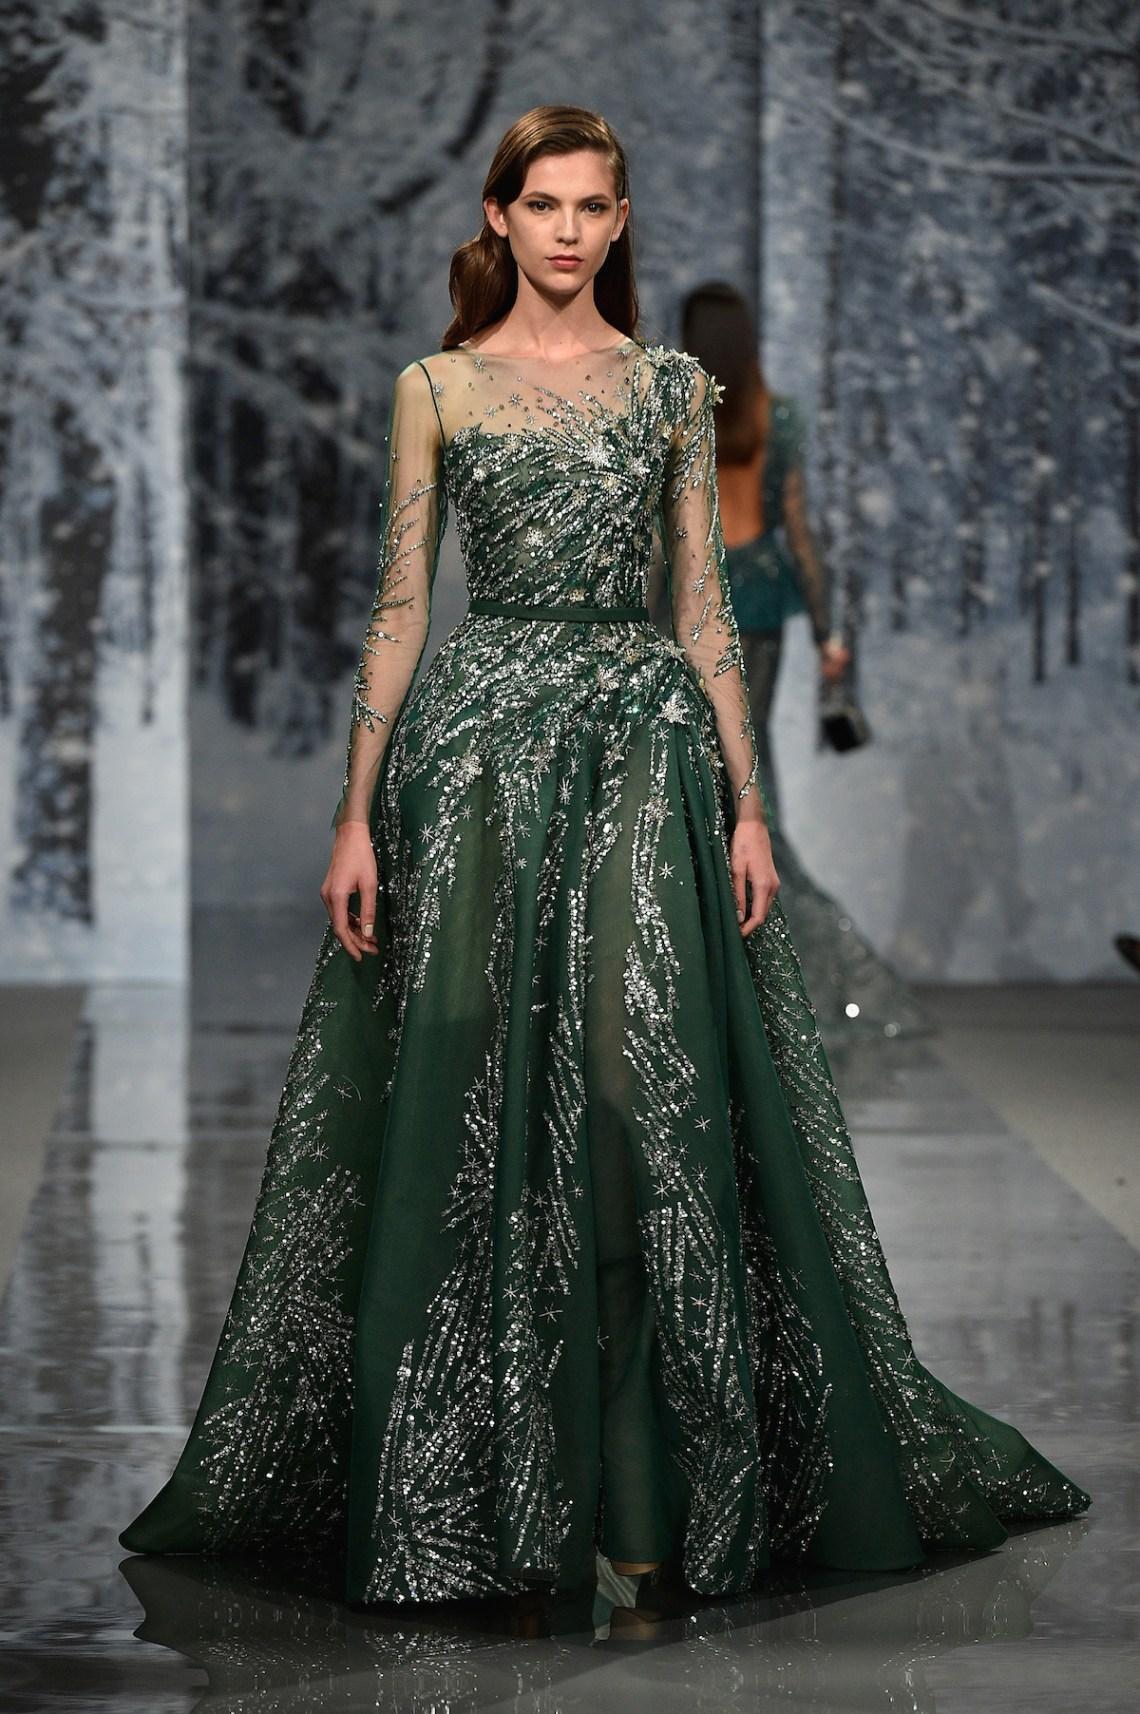 Ziad nakad couture fall winter 2017 18 fashion insider - Maison de haute couture ...